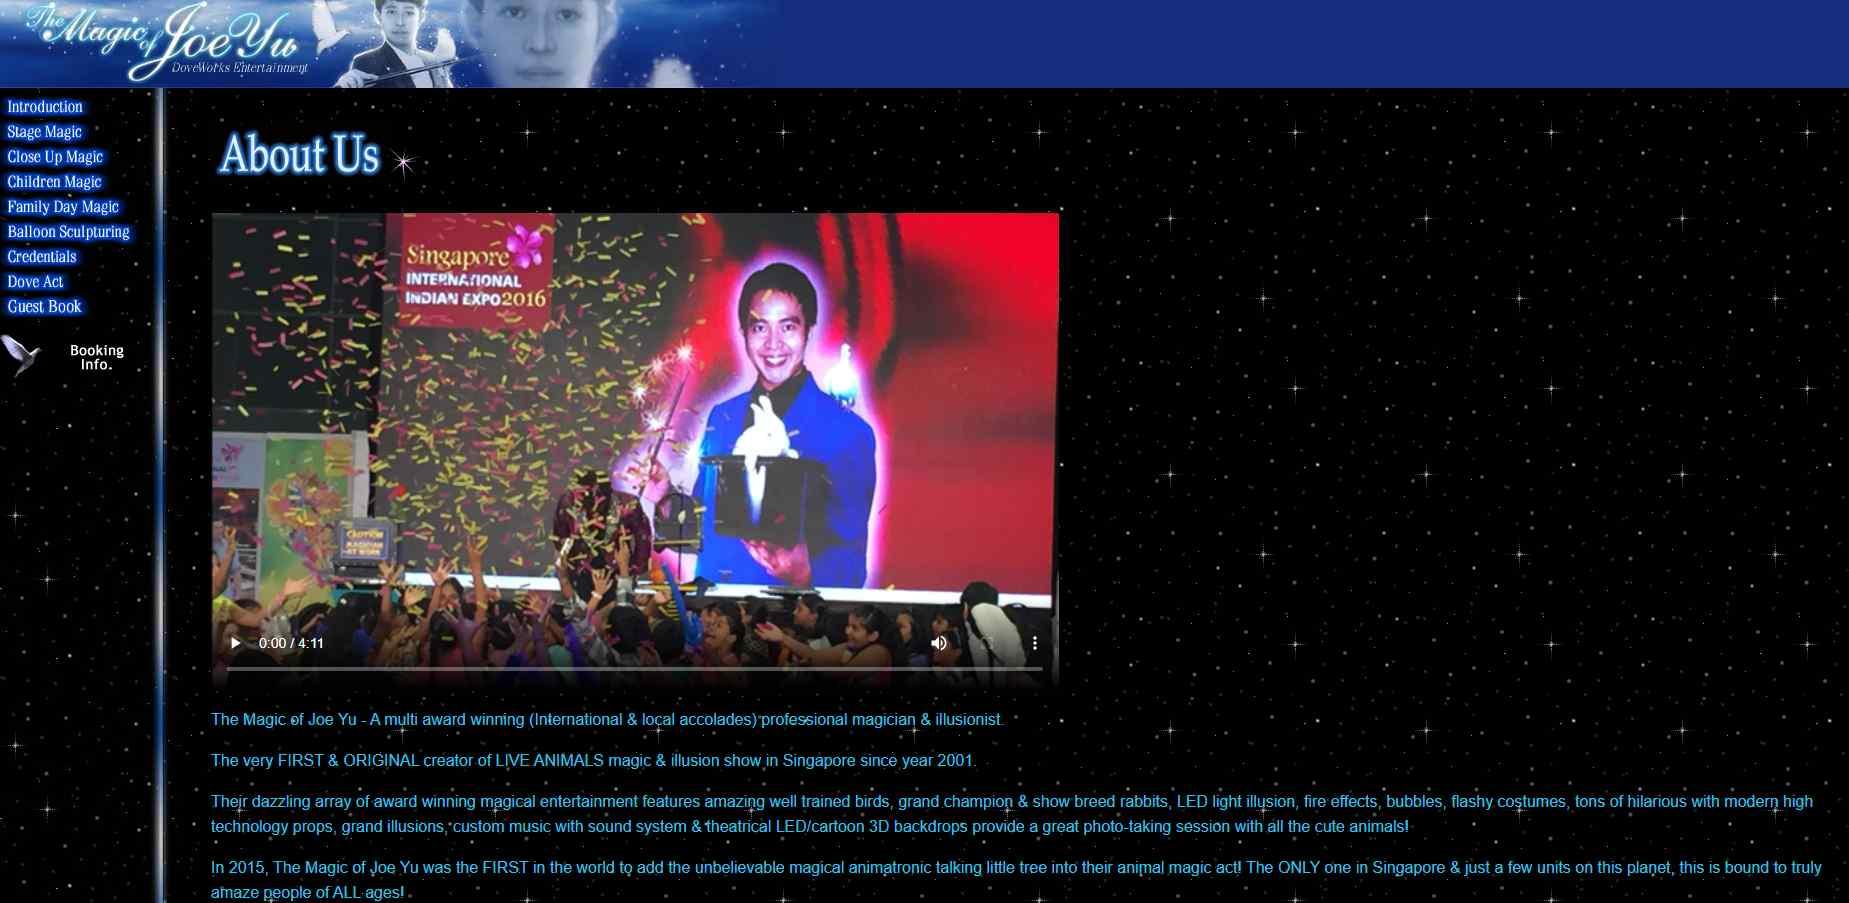 joeyu Top Magicians in Singapore